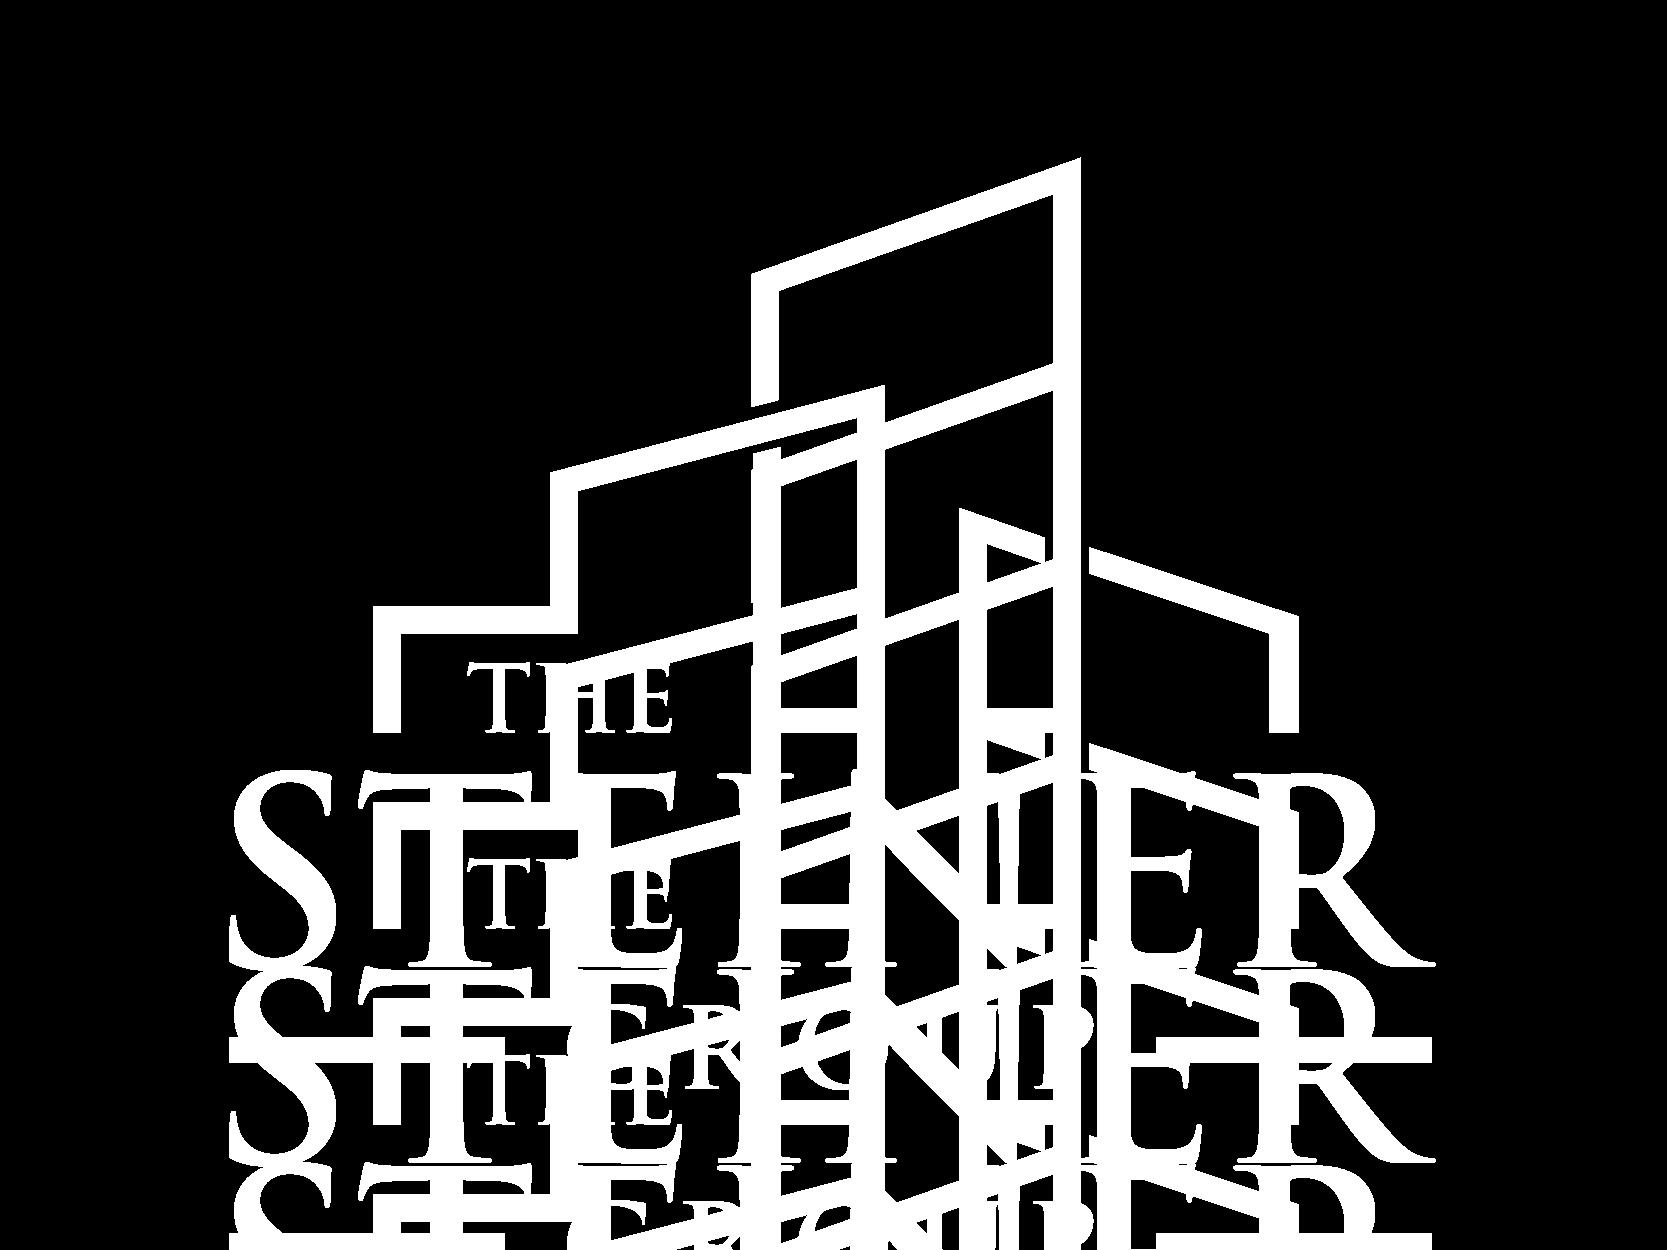 The Steiner Group